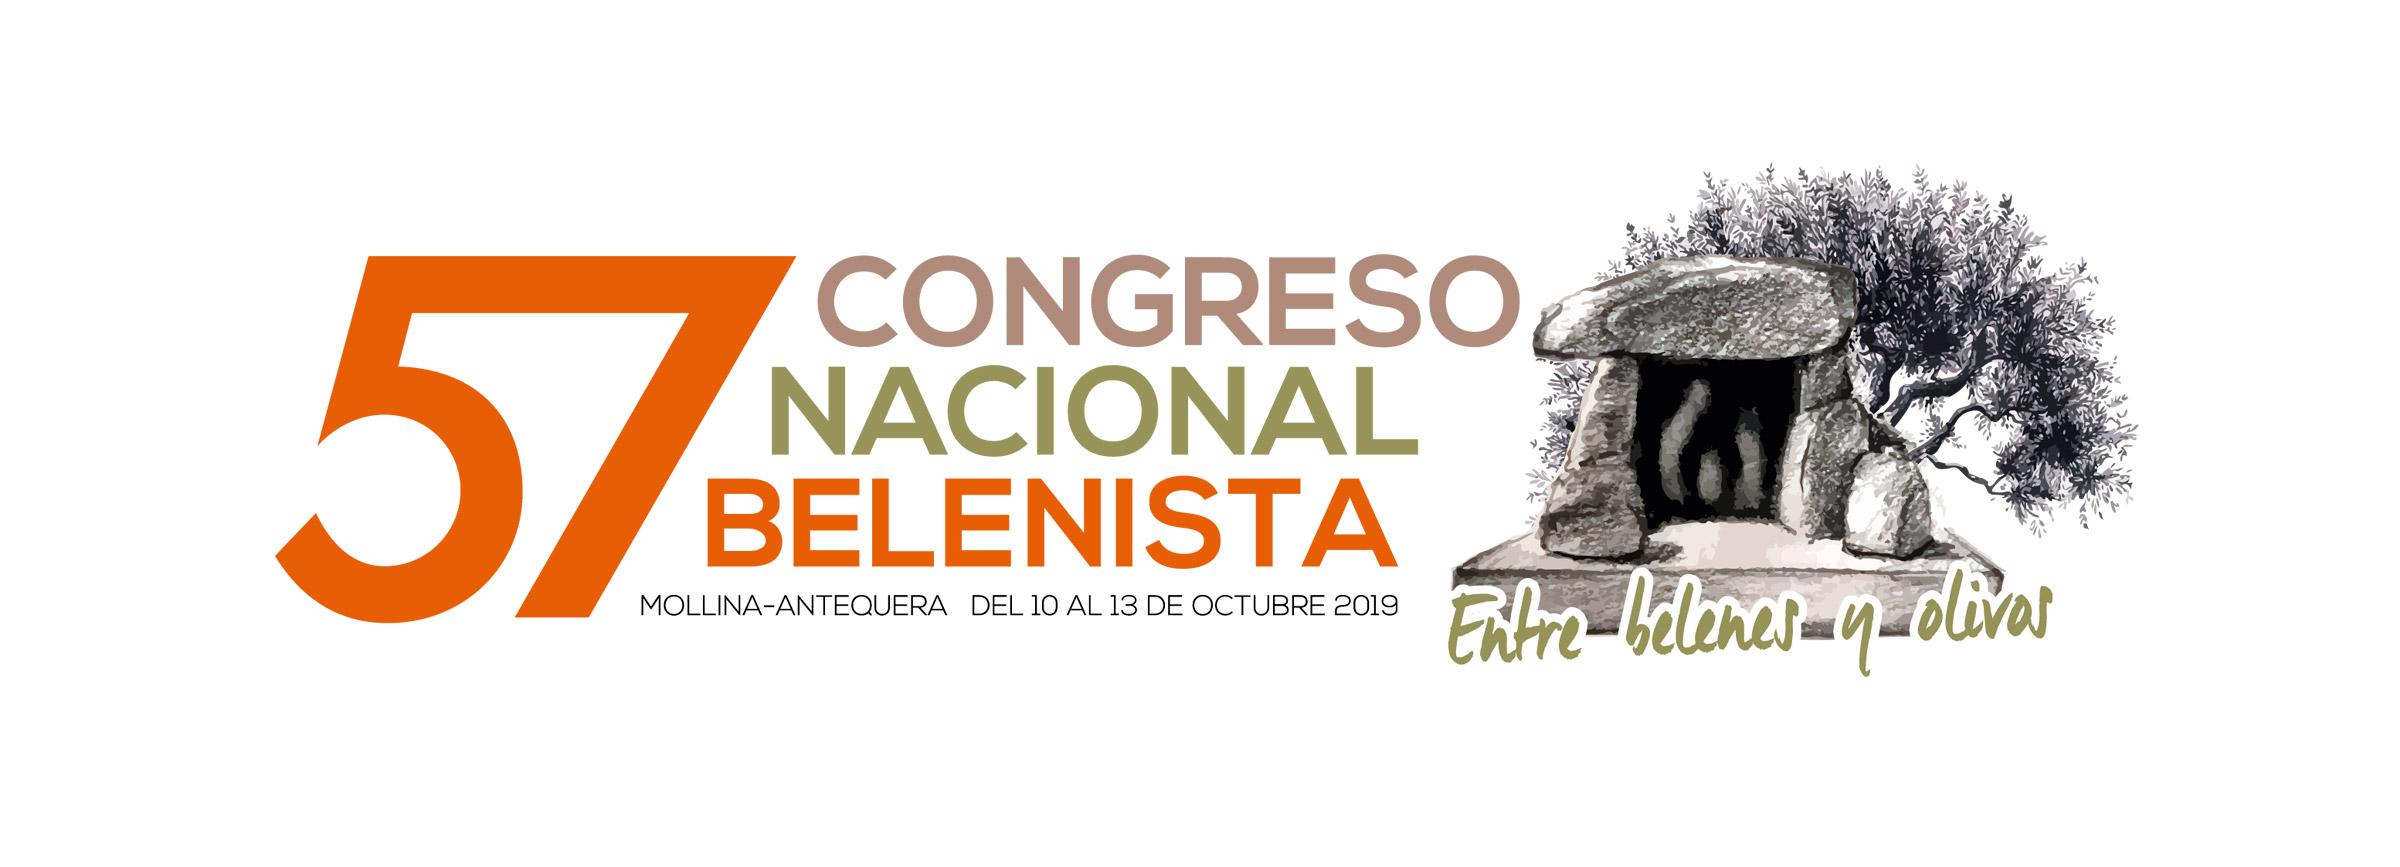 Museo Internacional de Arte Belenista FANS Marketing MÁLAGA